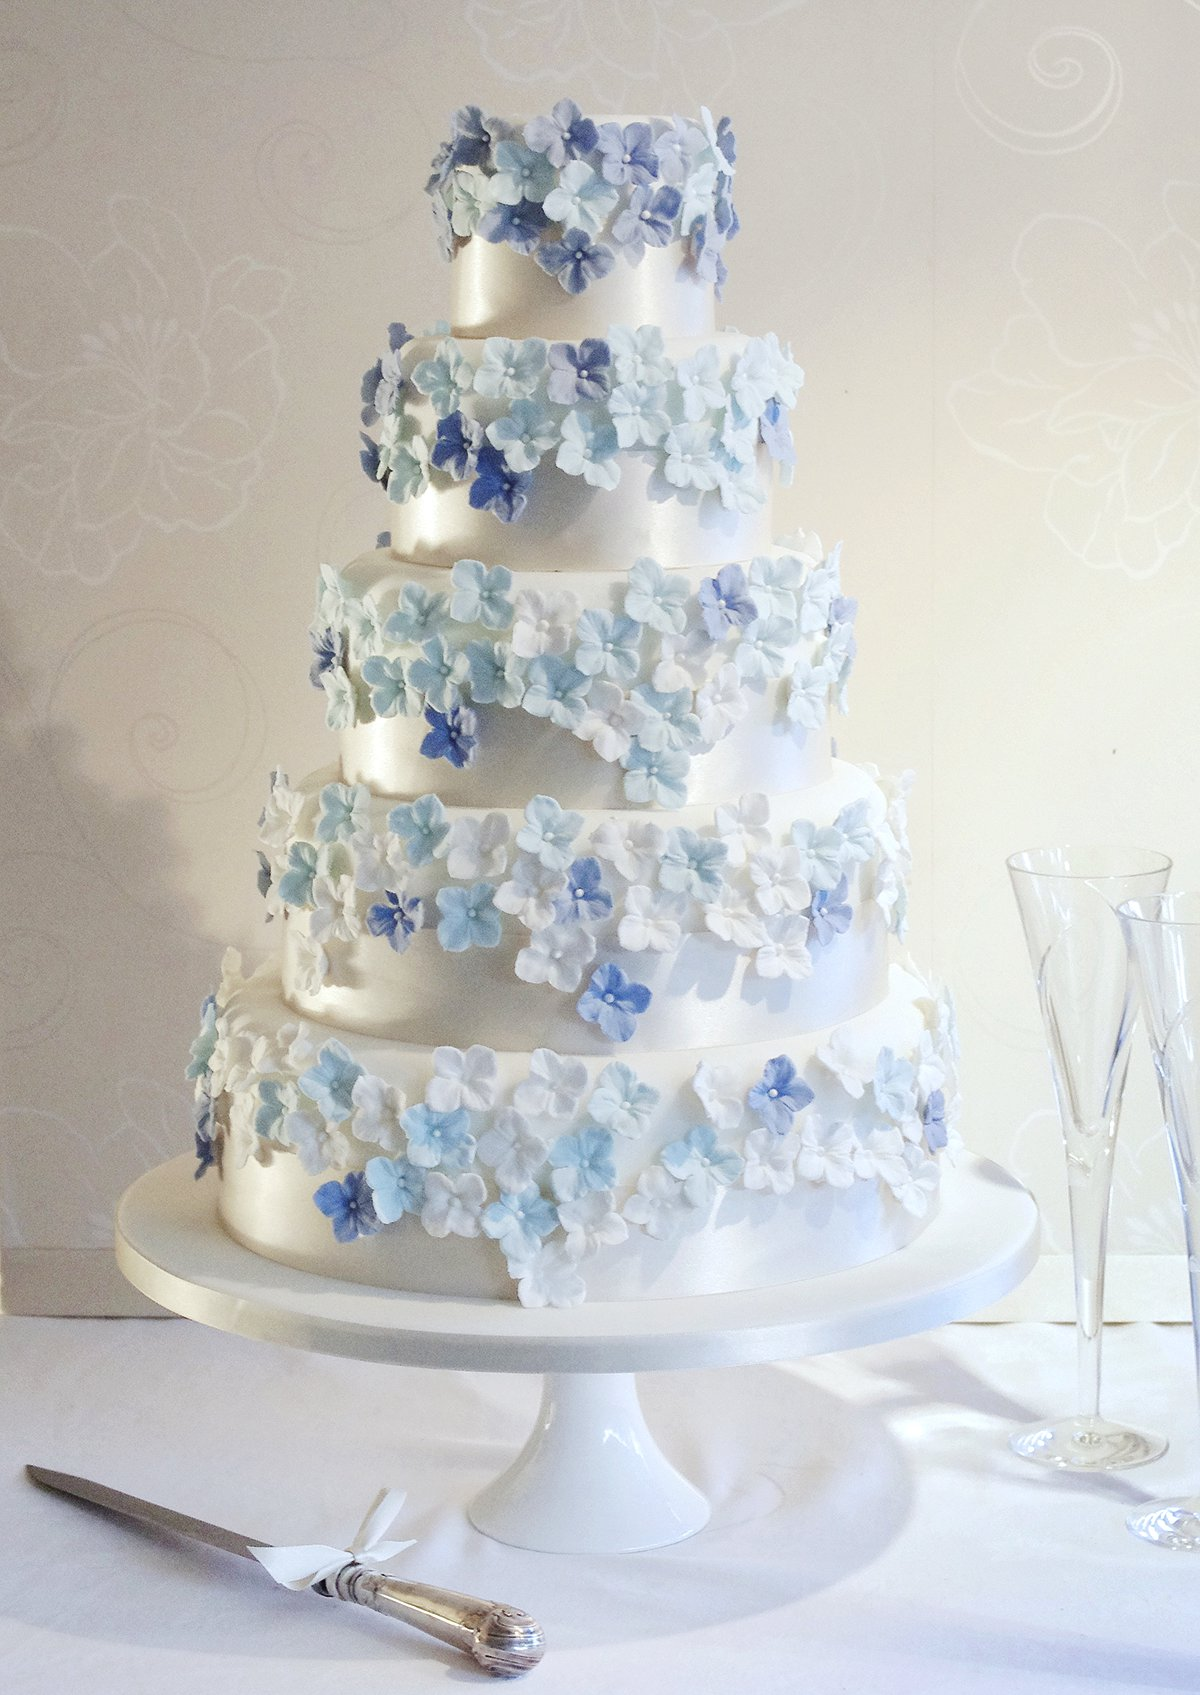 CAKE MAISON - HYDRANGEA DRIFT Serves 200 - £1200